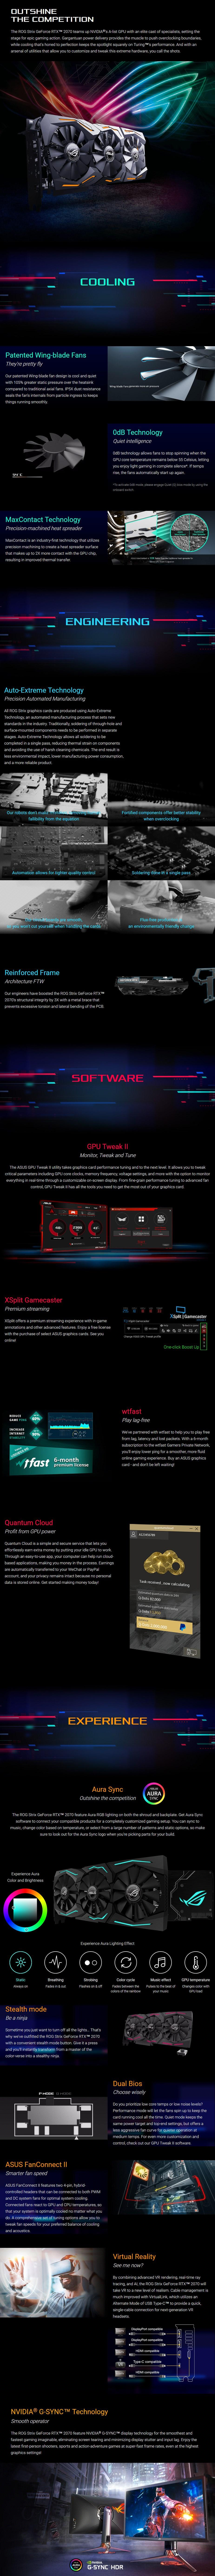 ASUS ROG Strix GeForce RTX 2070 OC Edition 8GB Video Card - Desktop Overview 1